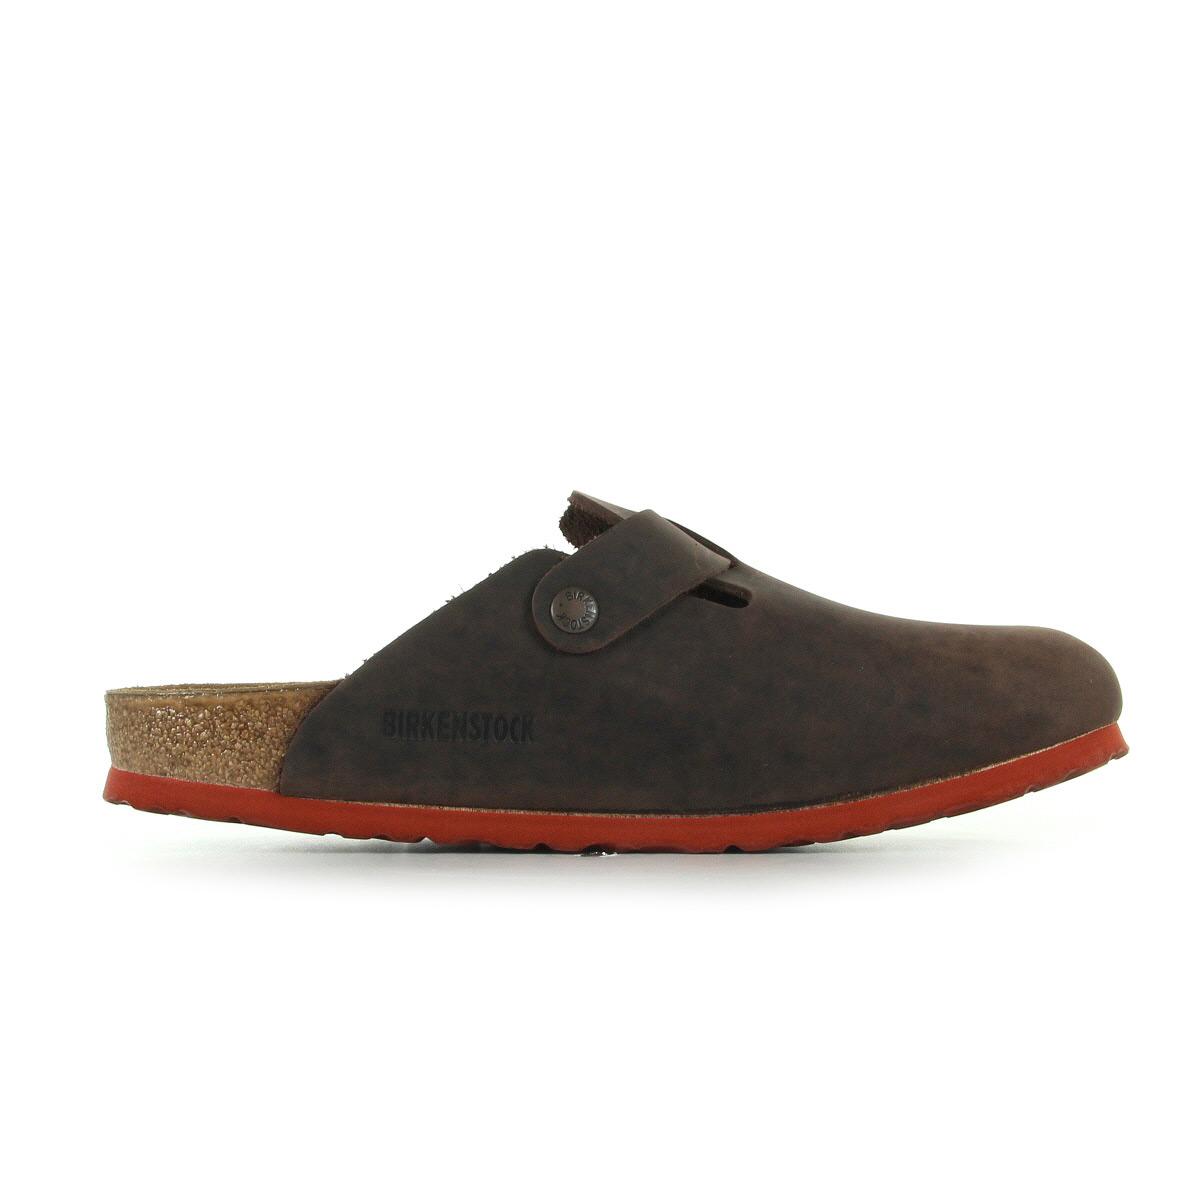 mules nu pieds birkenstock homme boston taille marron cuir a enfiler ebay. Black Bedroom Furniture Sets. Home Design Ideas